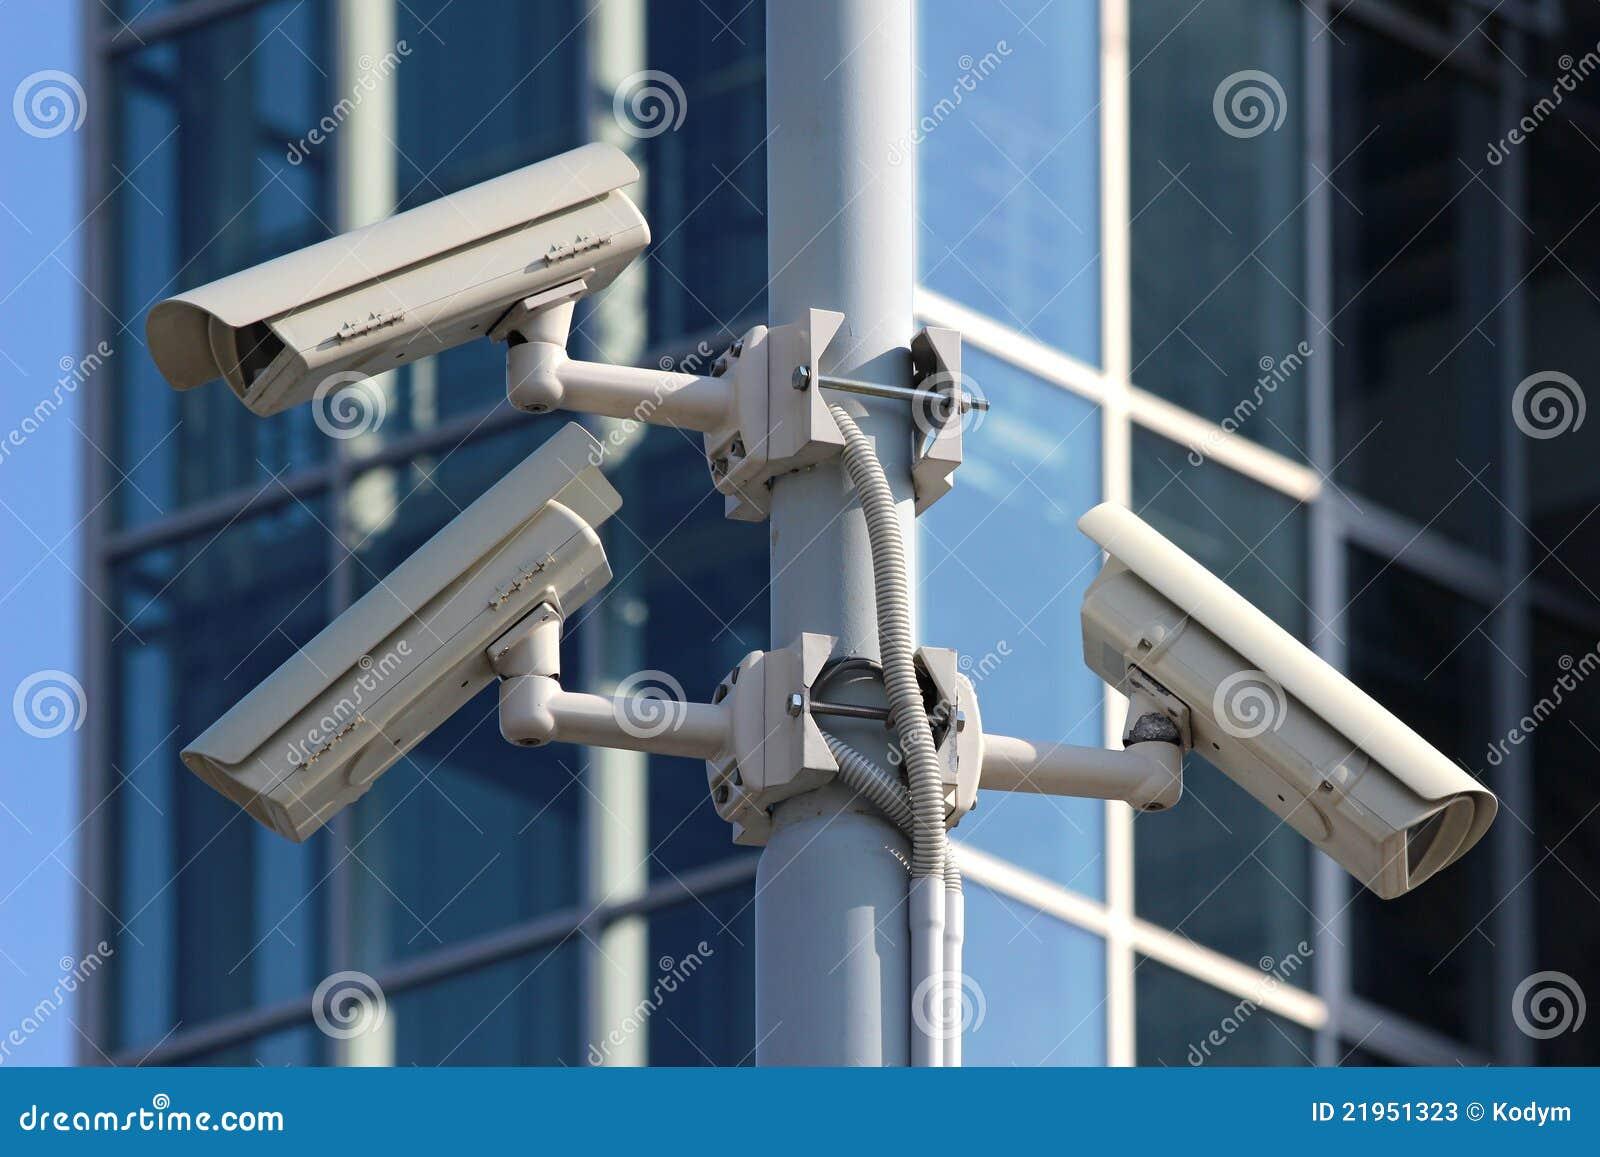 Three Cctv Security Cameras On The Street Pylon Stock